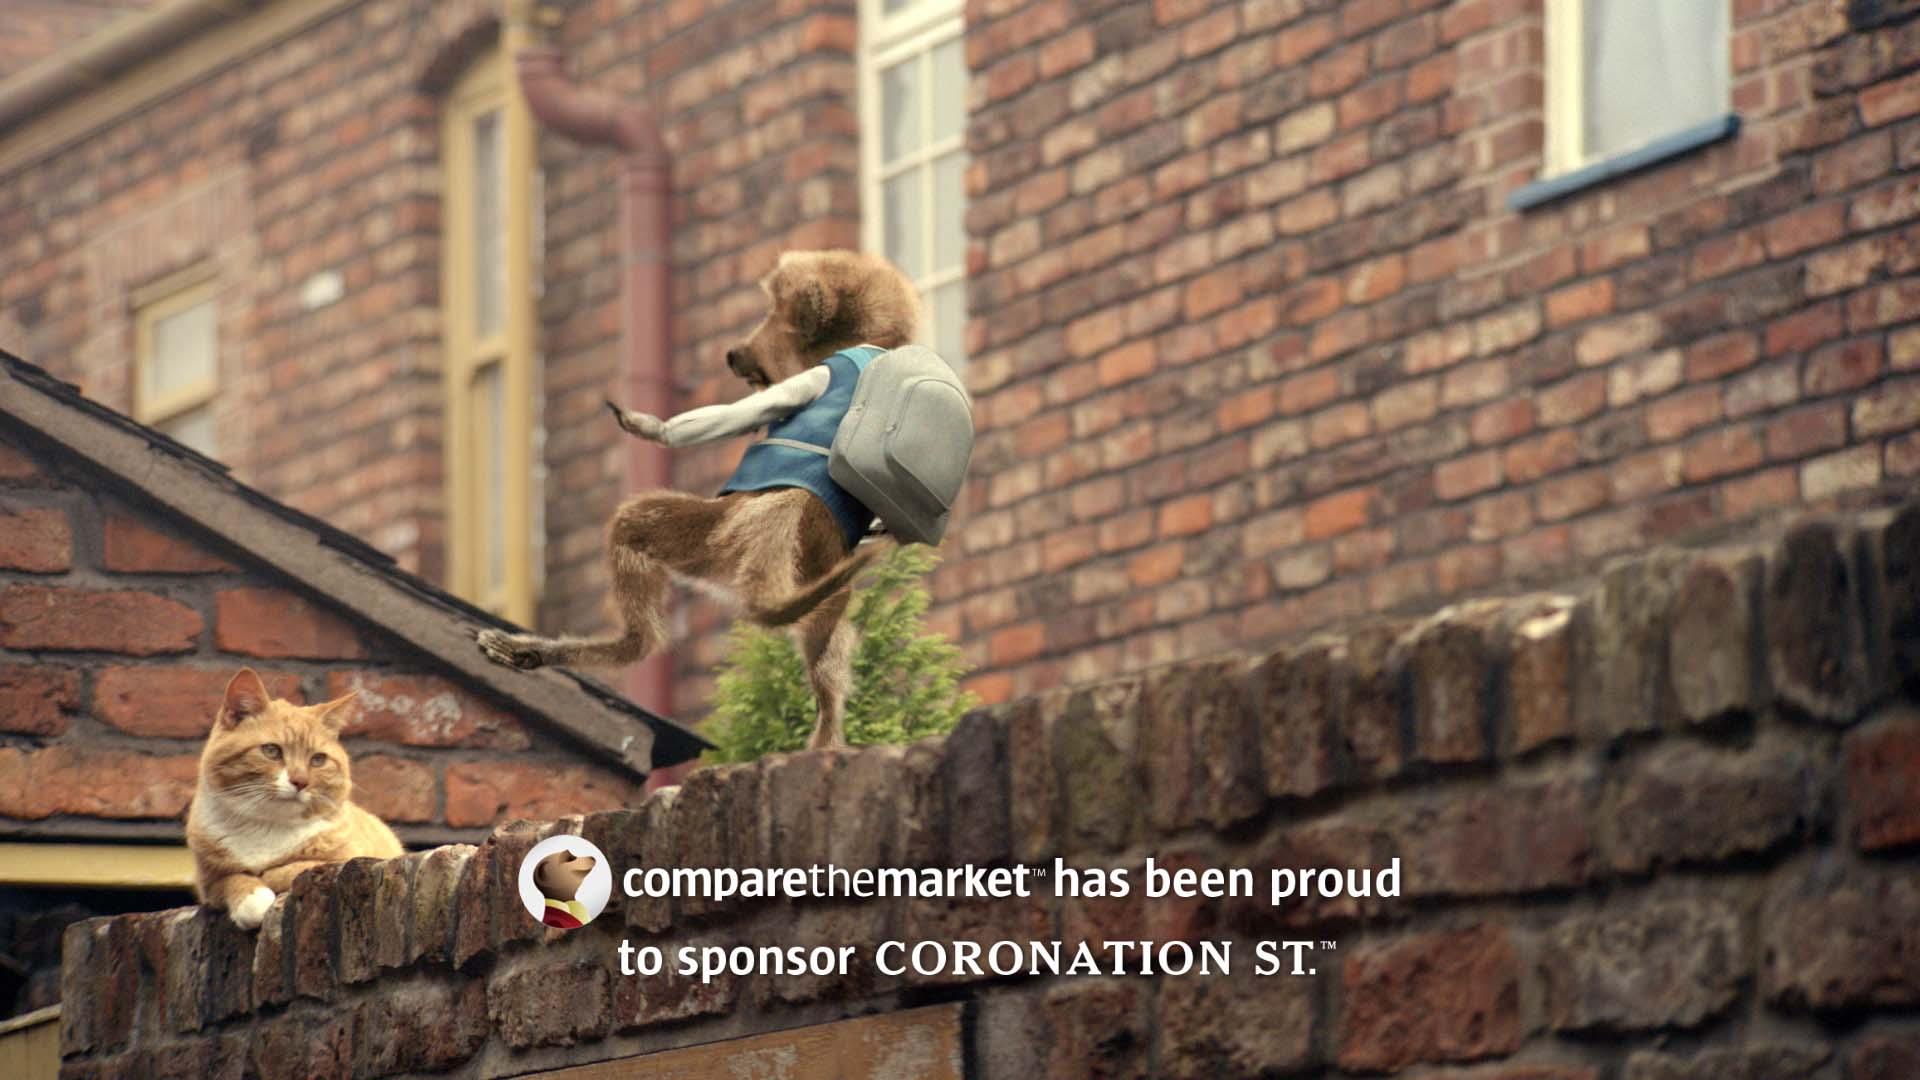 Compare the Market - Sponsors Coronation Street - Farwell